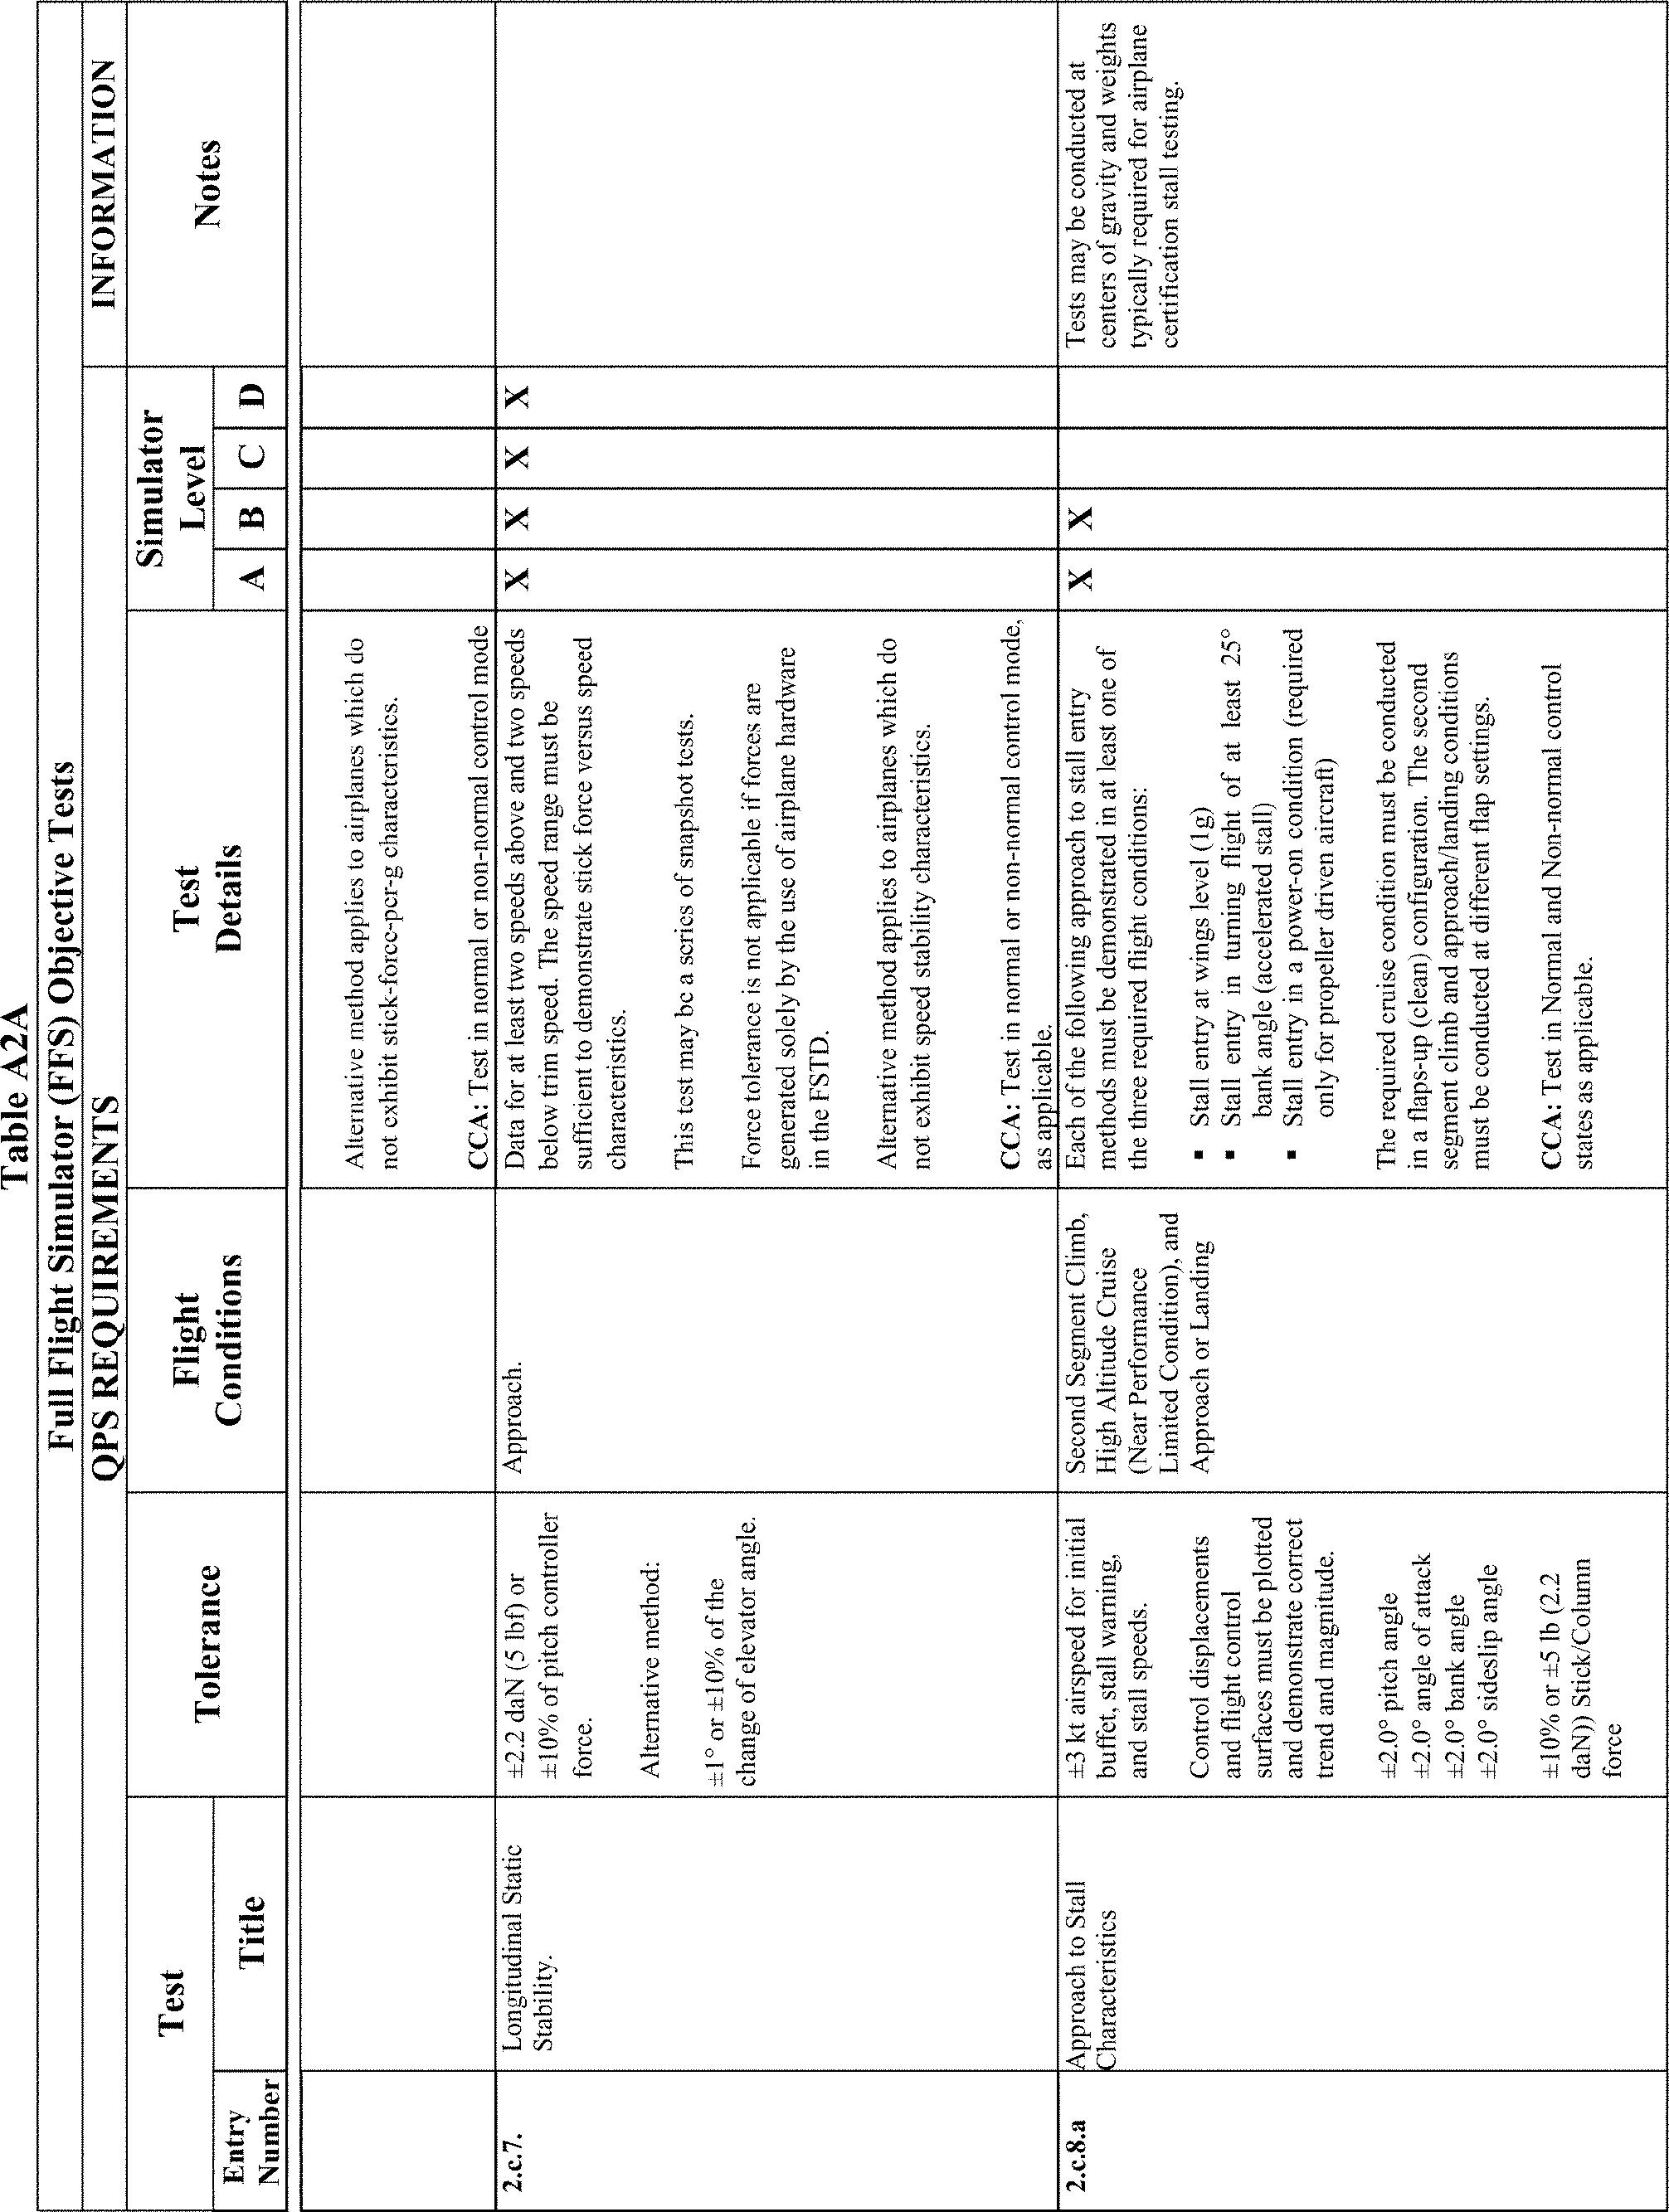 Federal Register Flight Simulation Training Device Qualification Ladder Logic Diagram For Elevator Start Printed Page 39534